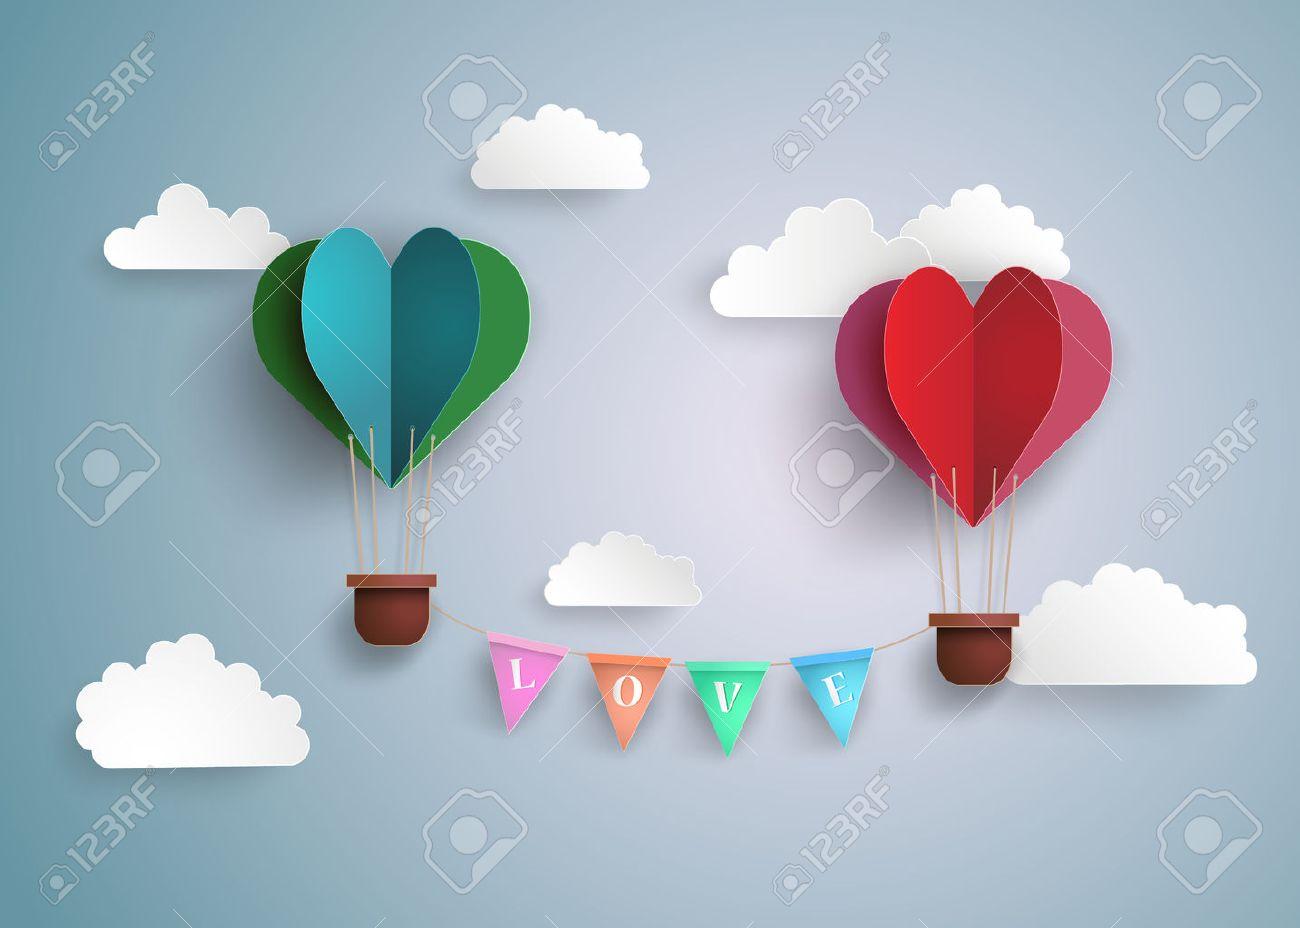 Origami made hot air balloon in a heart shape. - 52336328